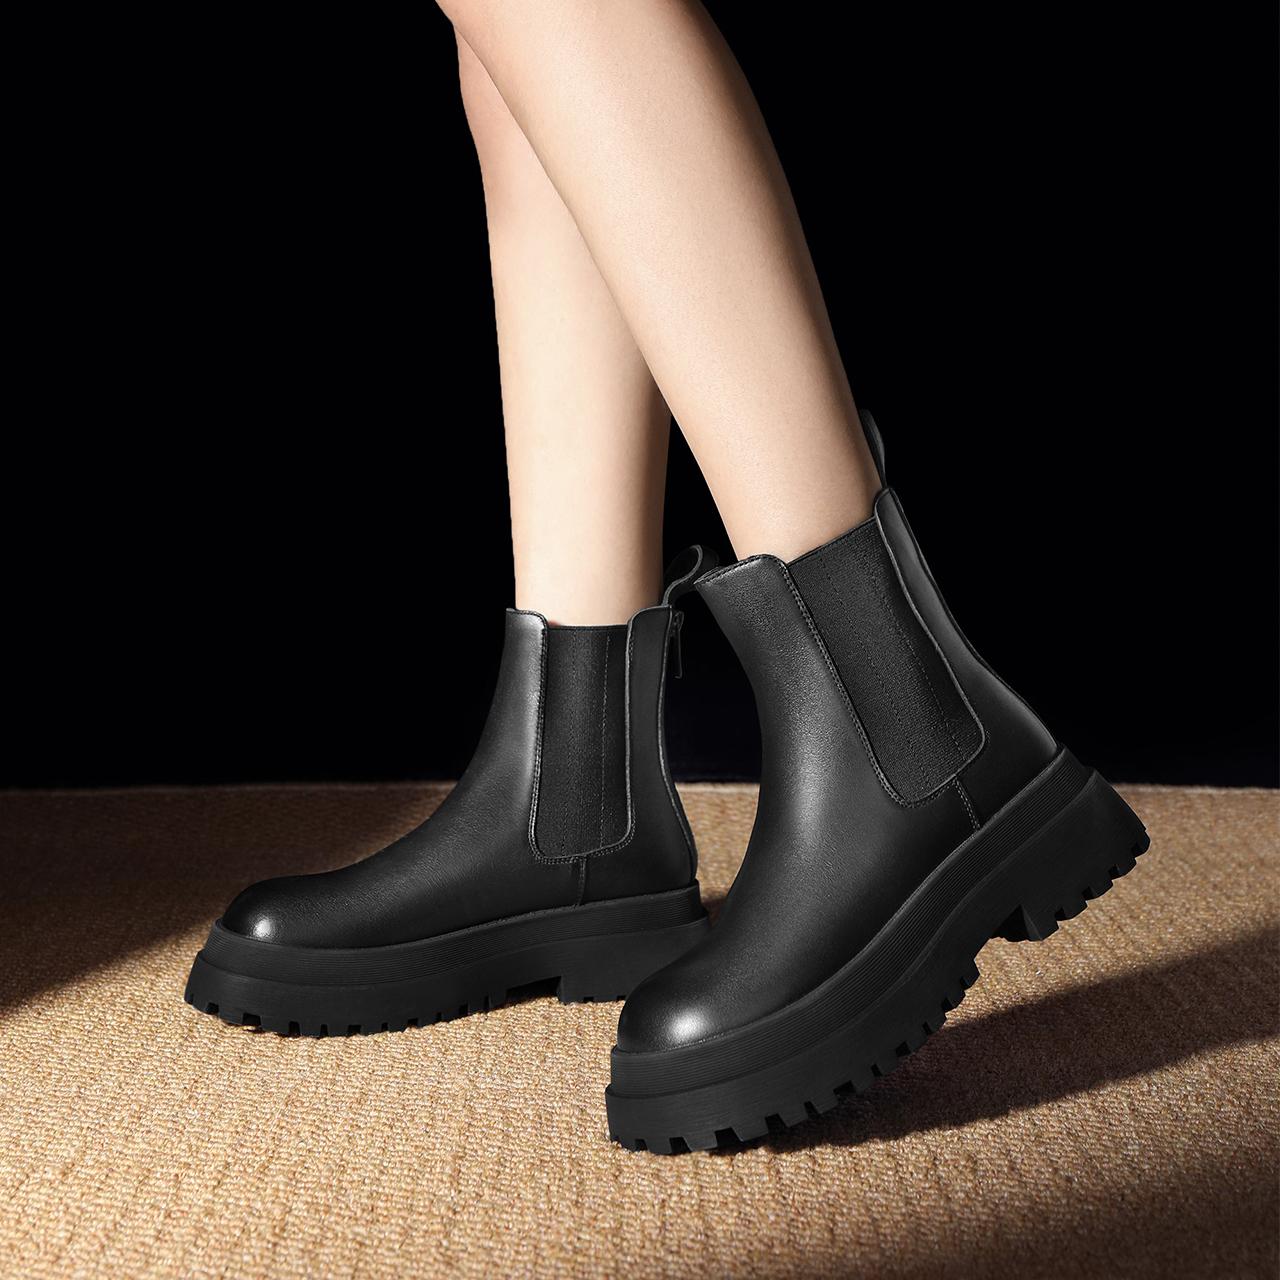 X2G2DDD1 冬新商场同款英伦风厚底短靴舒适加绒 2021 百丽切尔西靴女